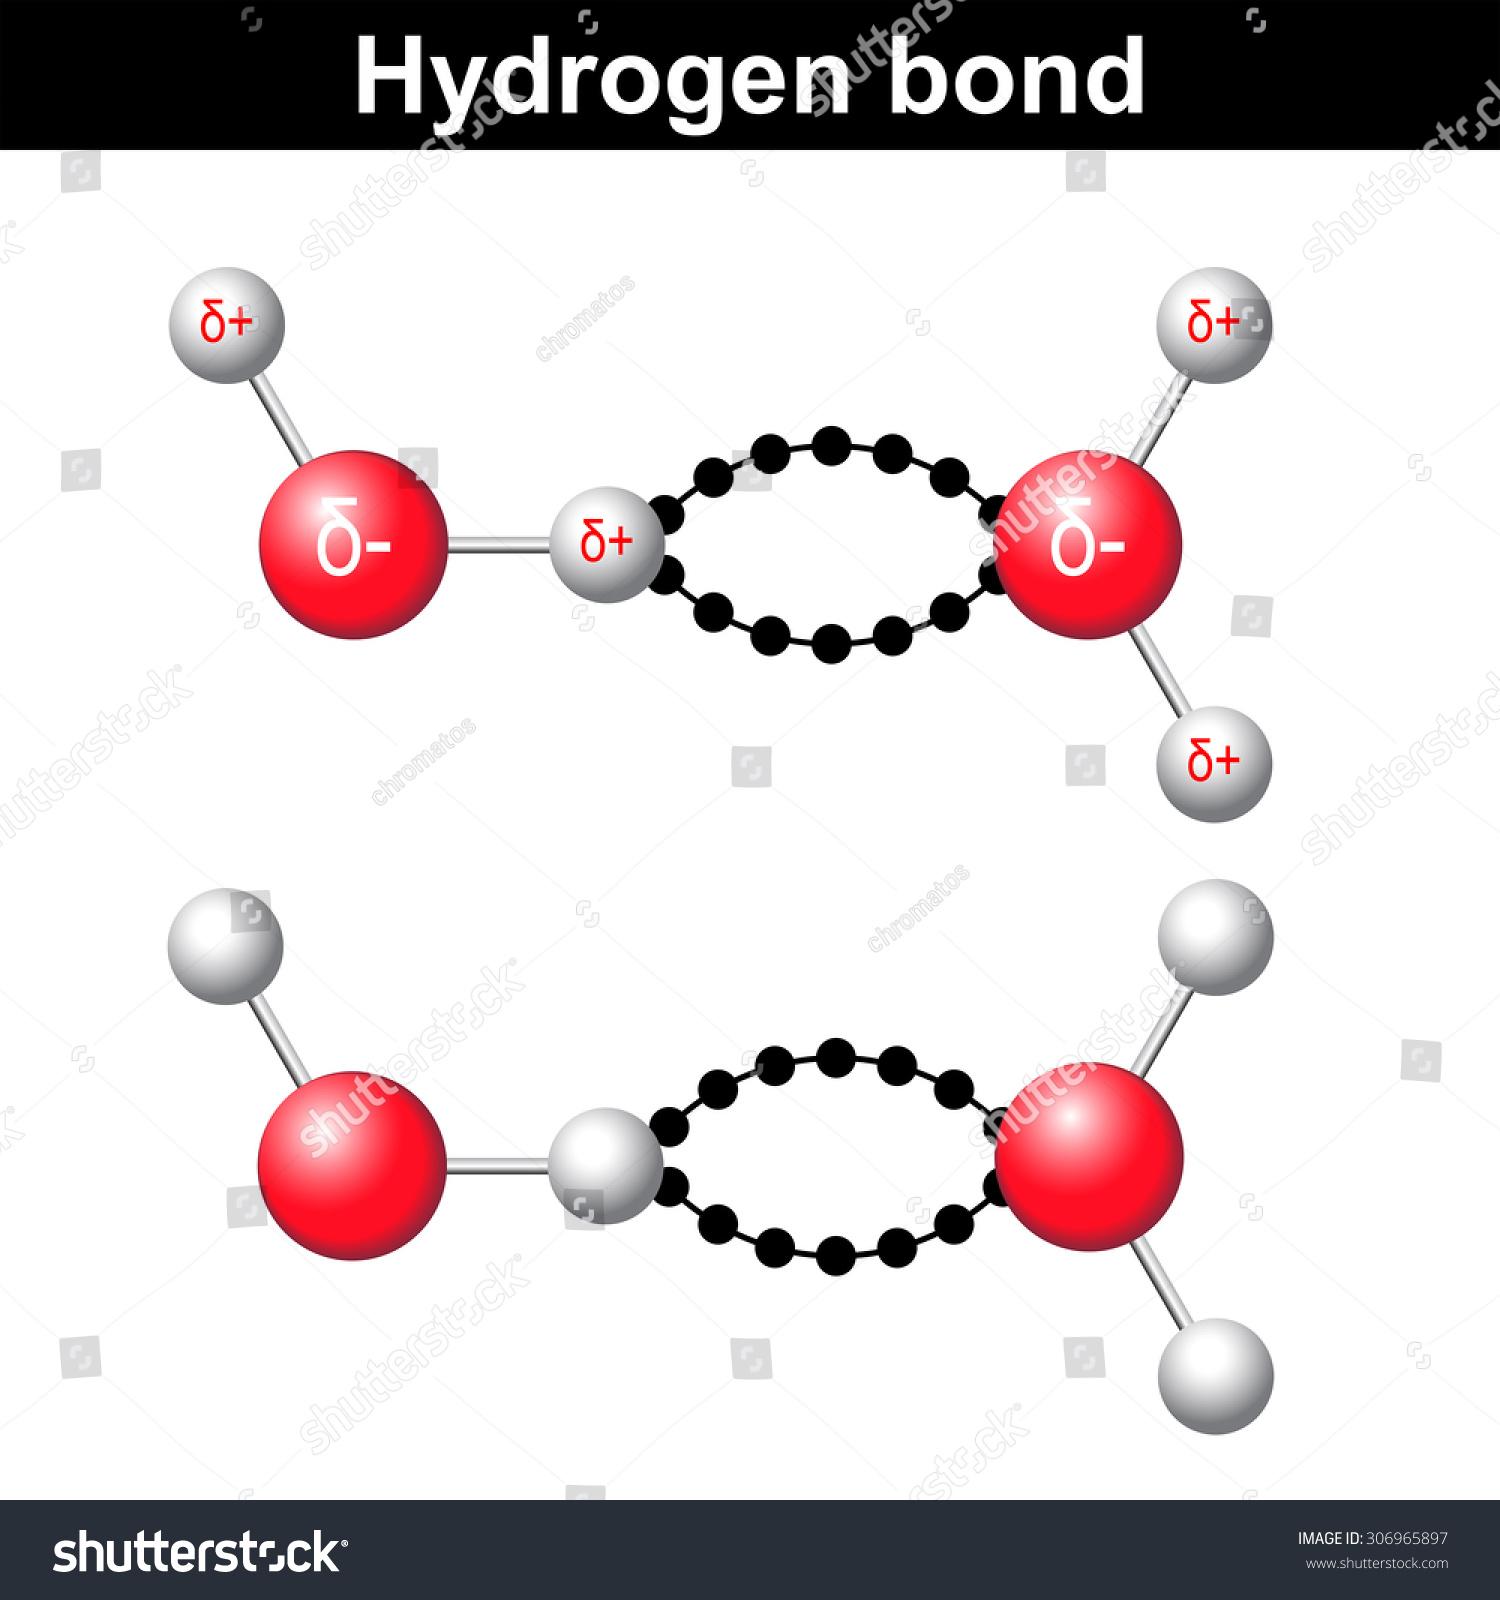 Hydrogen bonds in water article  Khan Academy